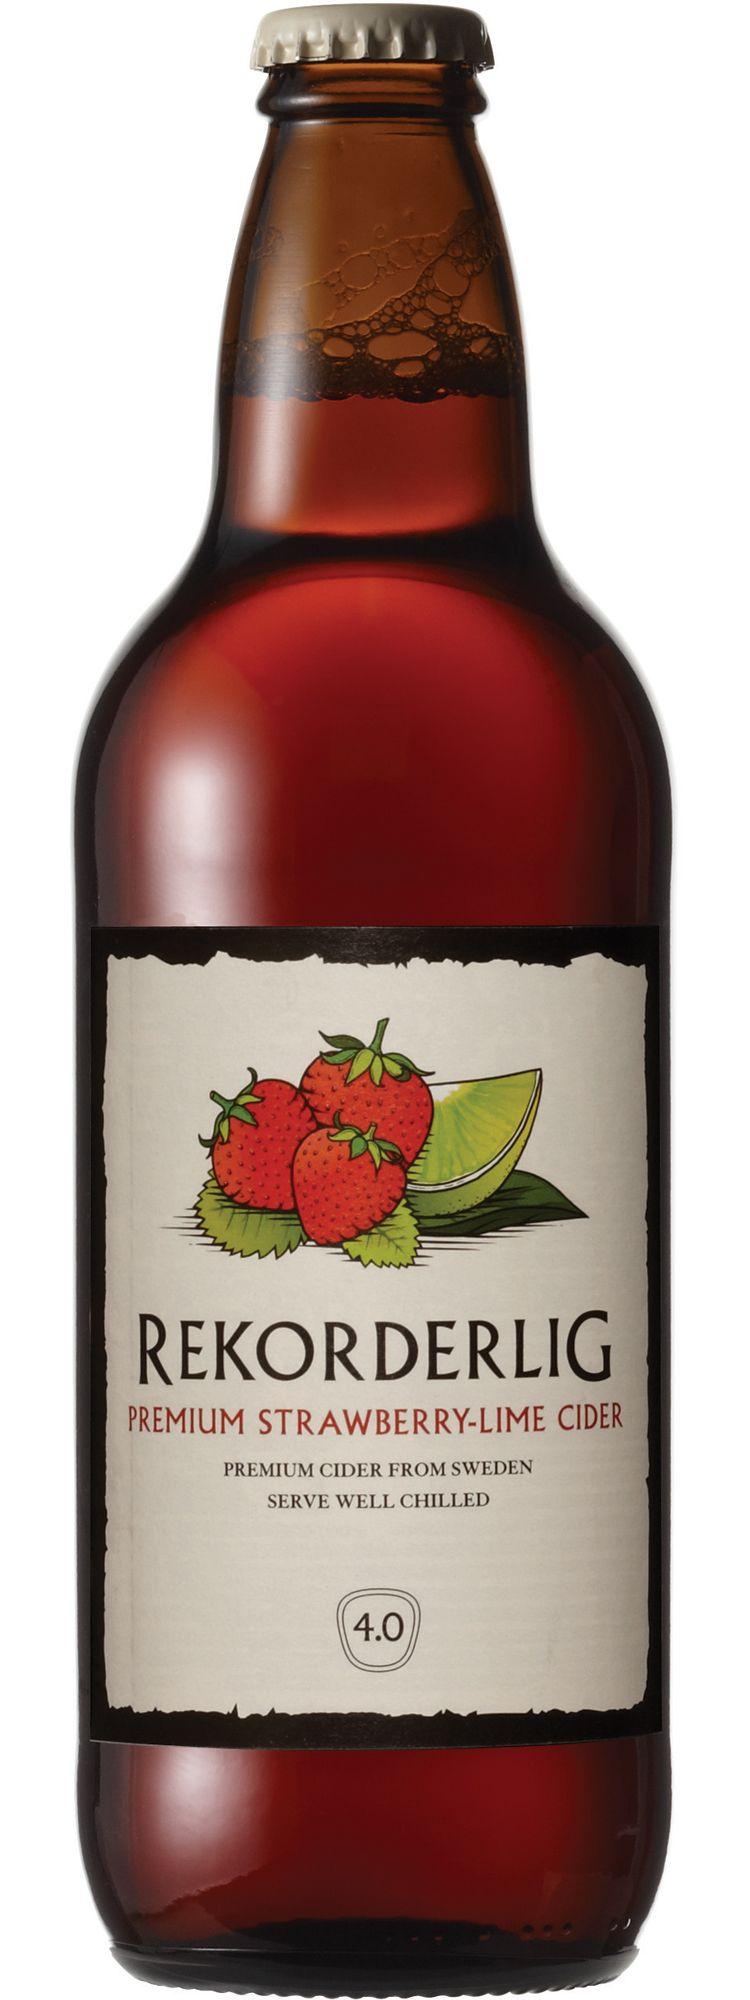 Rekorderlig Premium Strawberry Lime Cider 500ml Soooooo Good Strawberry Lime Strawberry Cider Cider